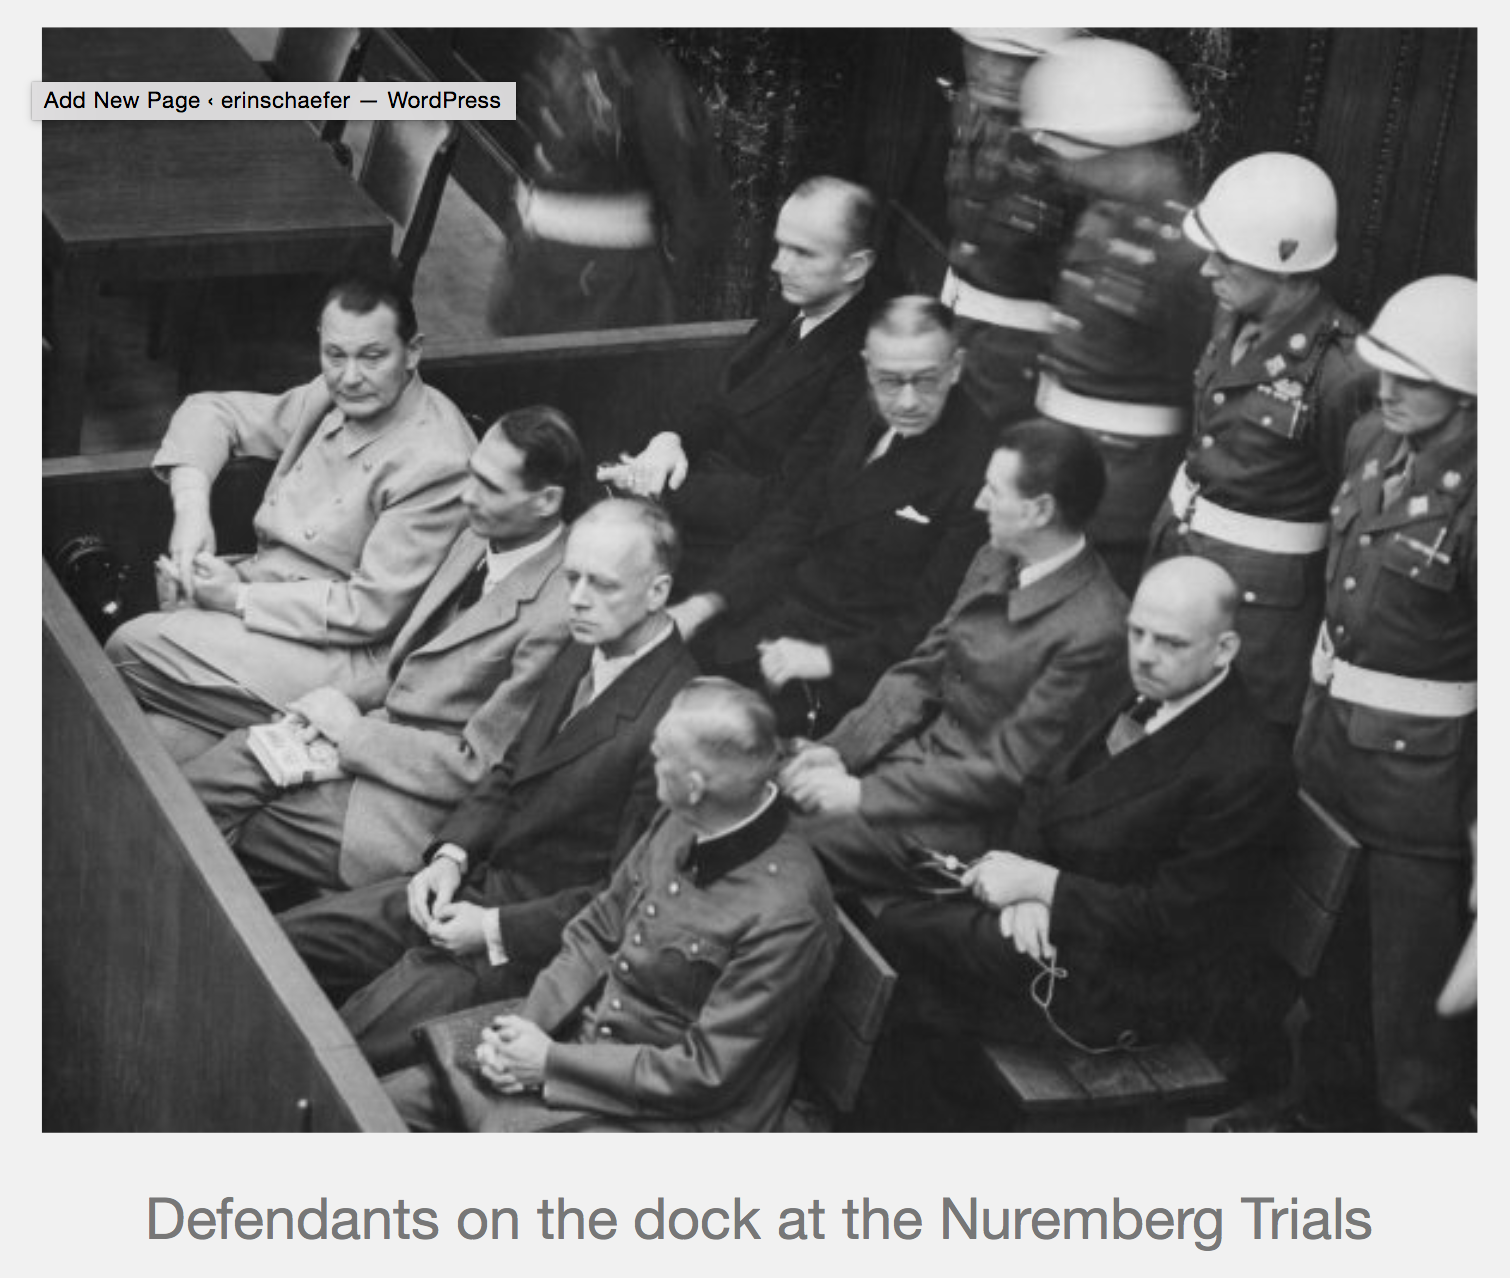 Nuremberg Trials Defendants on the Dock with Caption